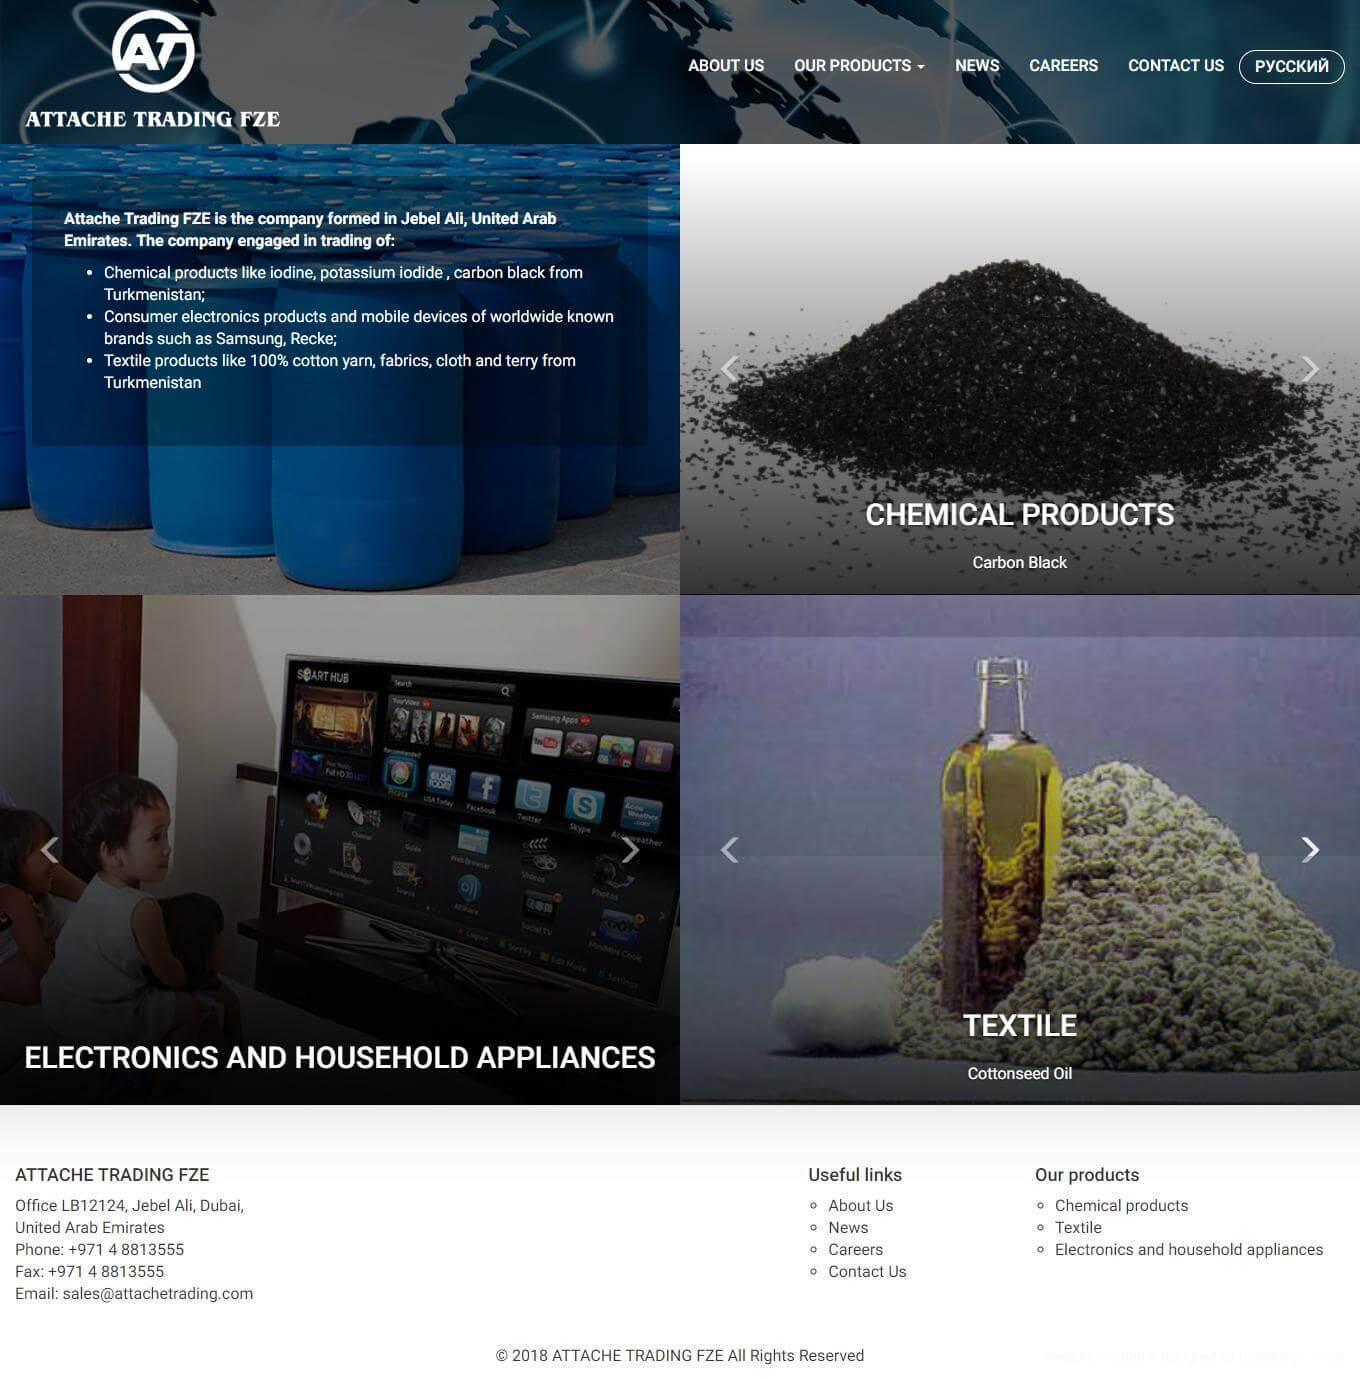 Website design and website development ATTACHE TRADING FZE